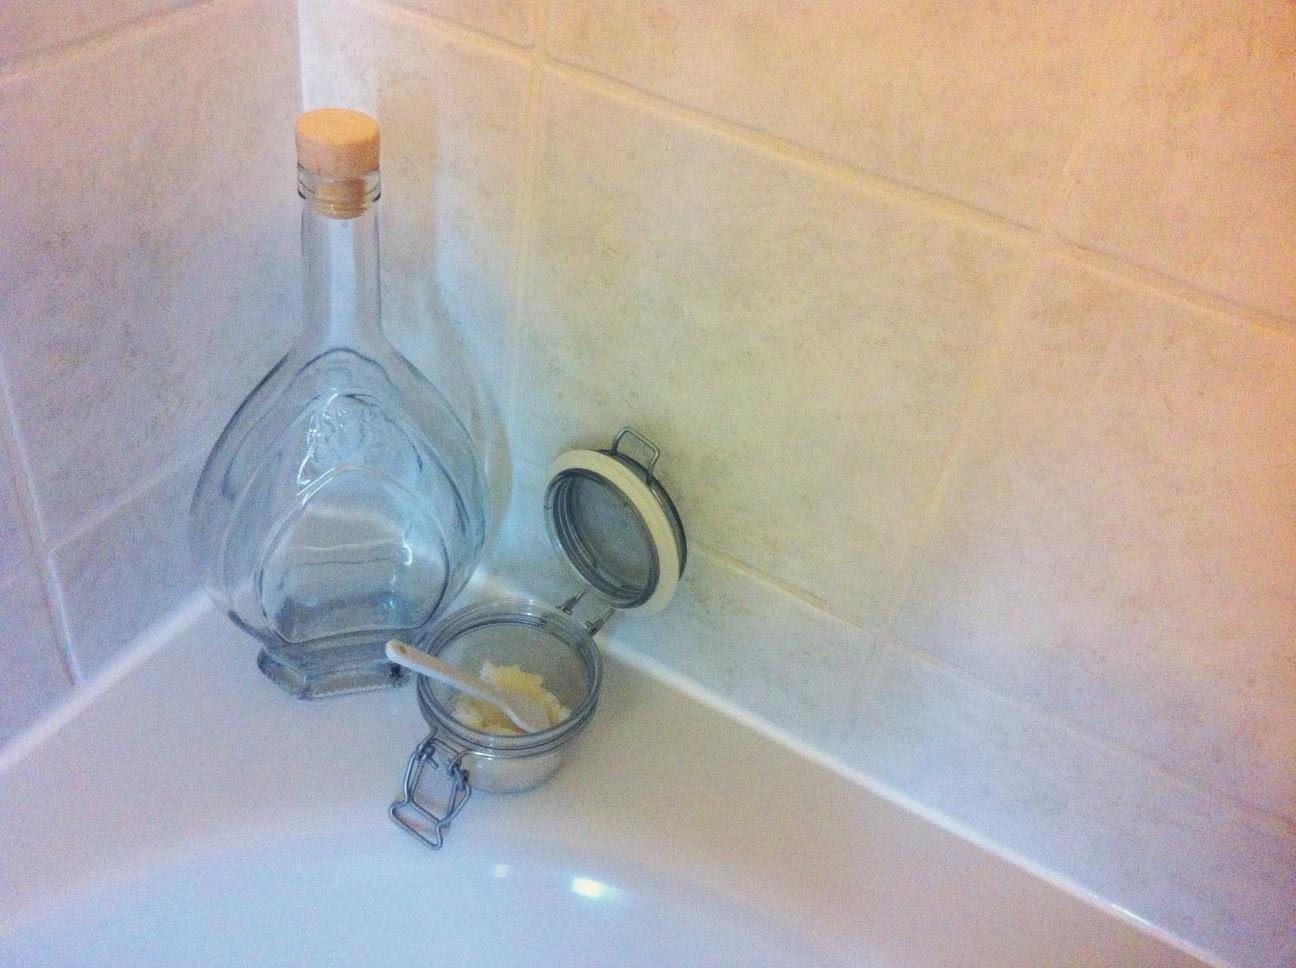 scrub home made fai da te, scrub miele e zucchero, cosmetici biologici, ecobio